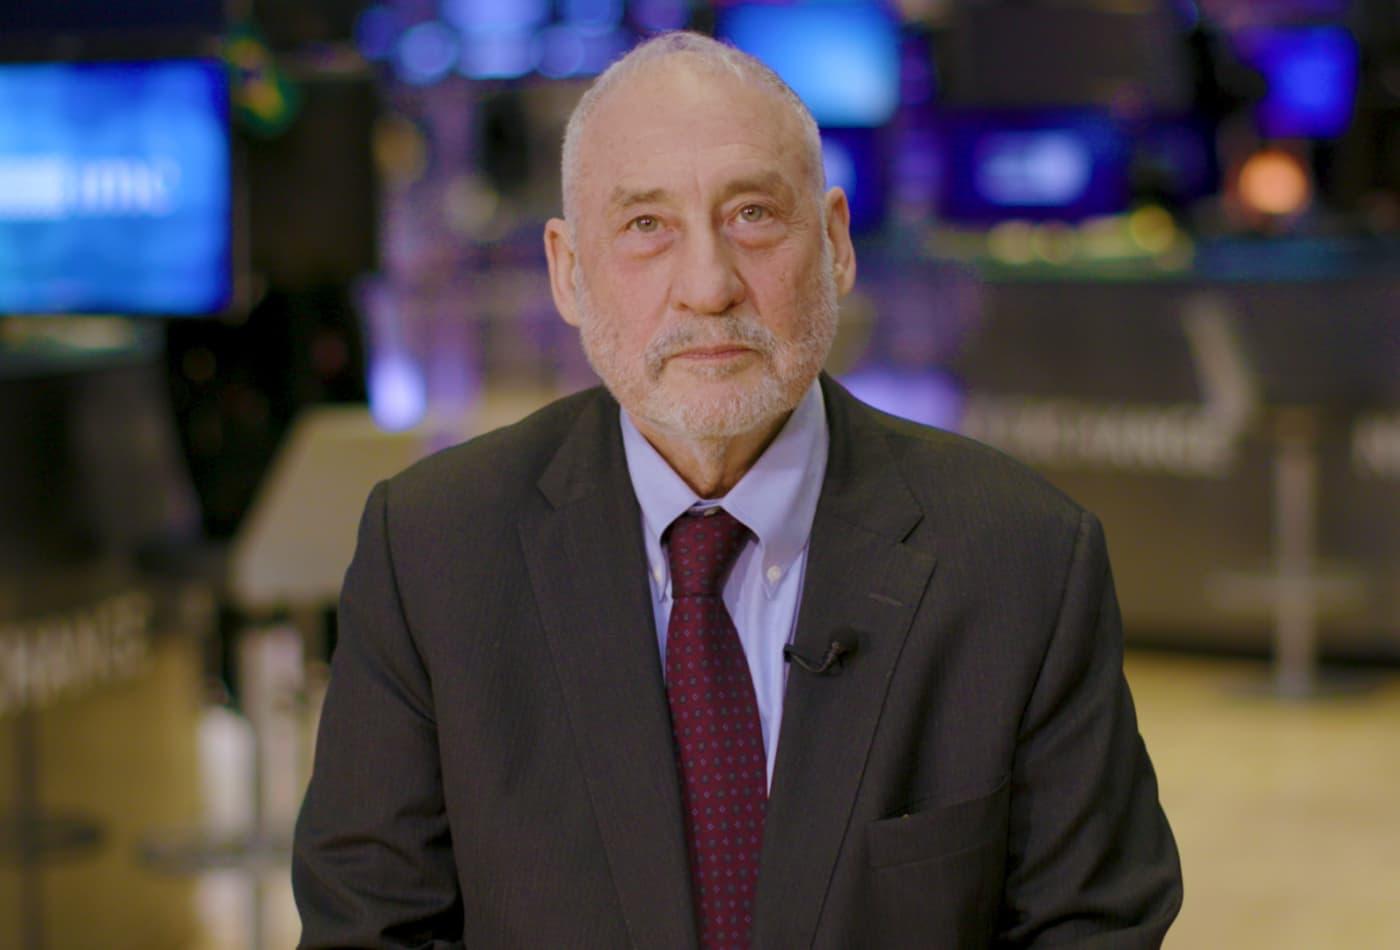 Joseph Stiglitz: Three headwinds that could cause the next recession